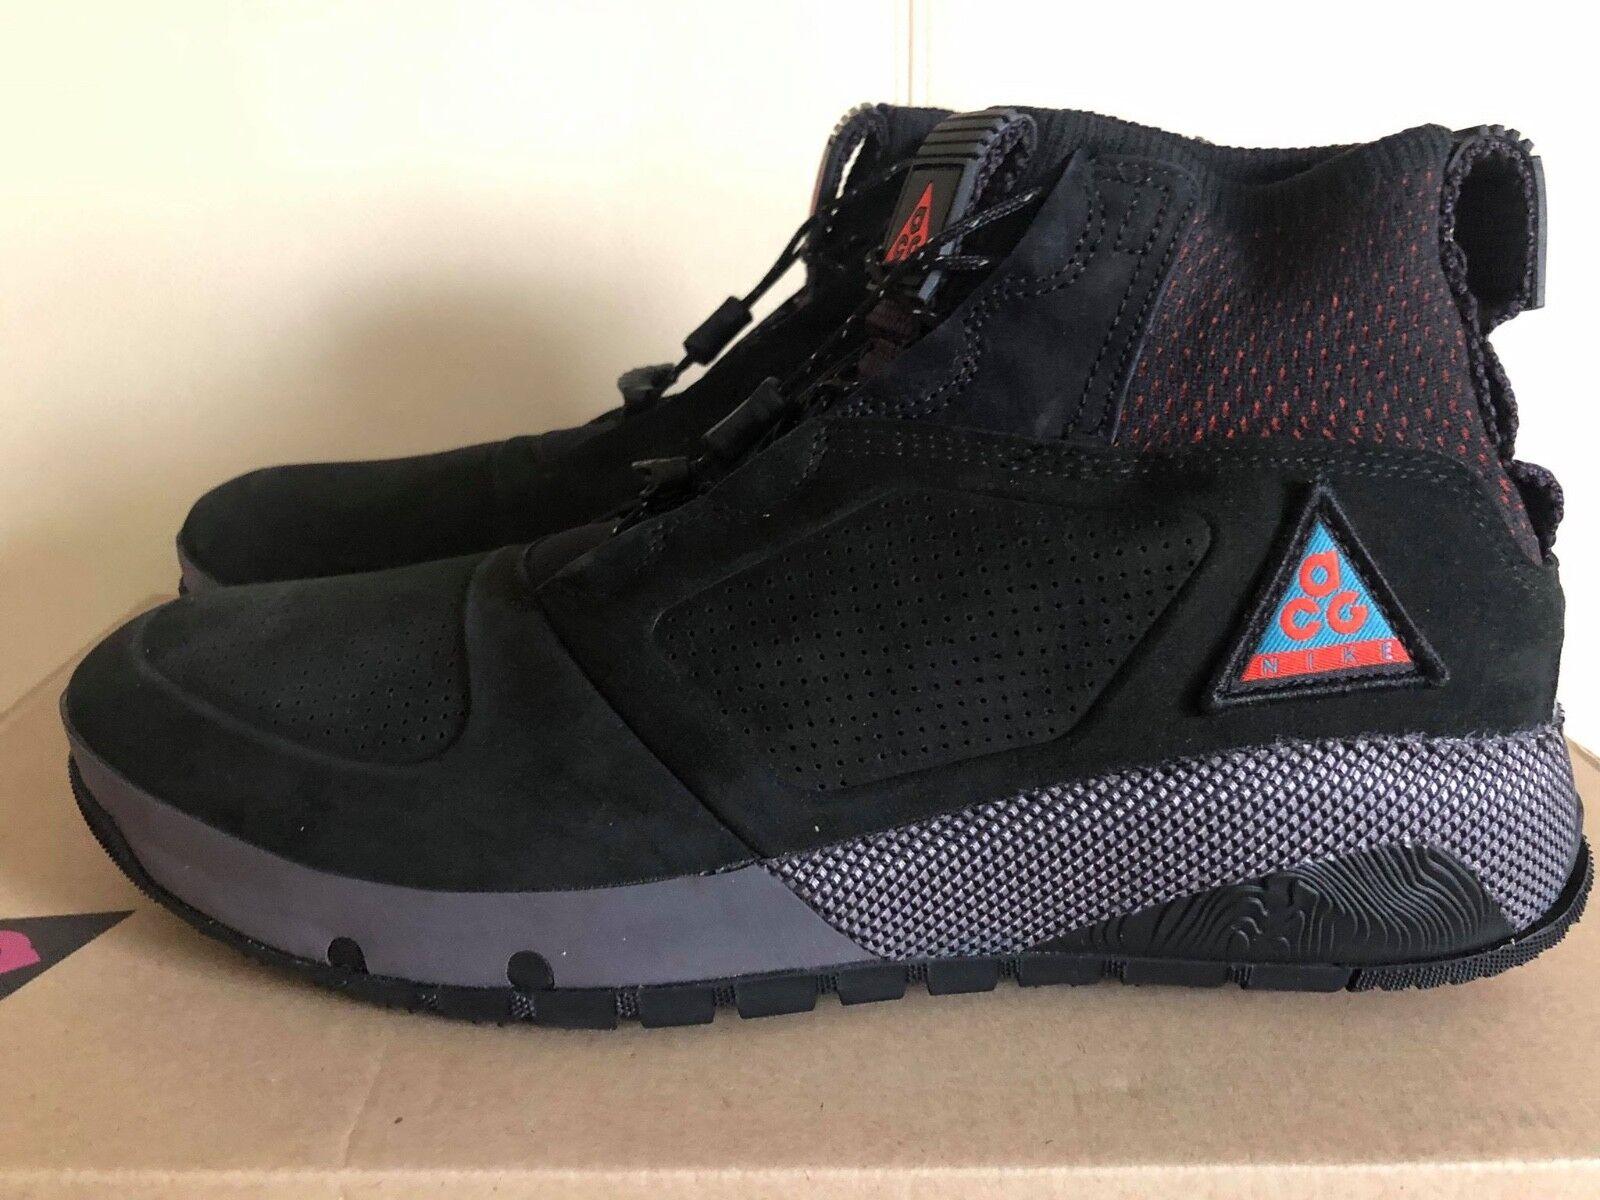 Nike ACG Ruckel Ridge Black Geode Teal Sneaker Boot AQ9333-002 Outdoor Uni shoes